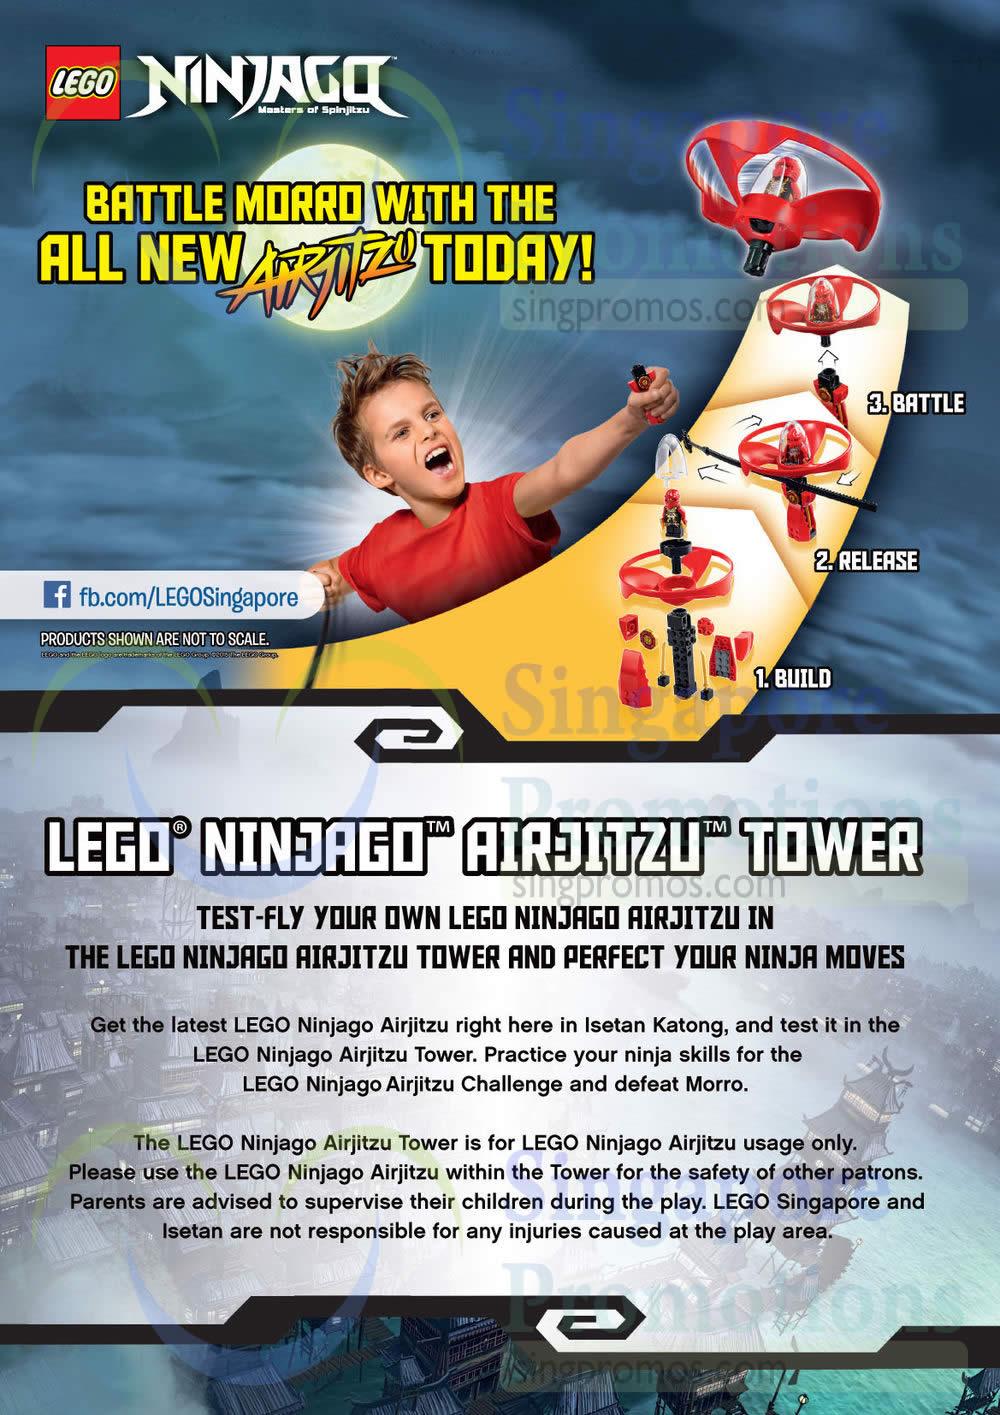 Lego Ninjago Airjitsu Tower, Isetan Katong, Battle Morro, Toys, Lego Ninjago Airjitsu Challenge